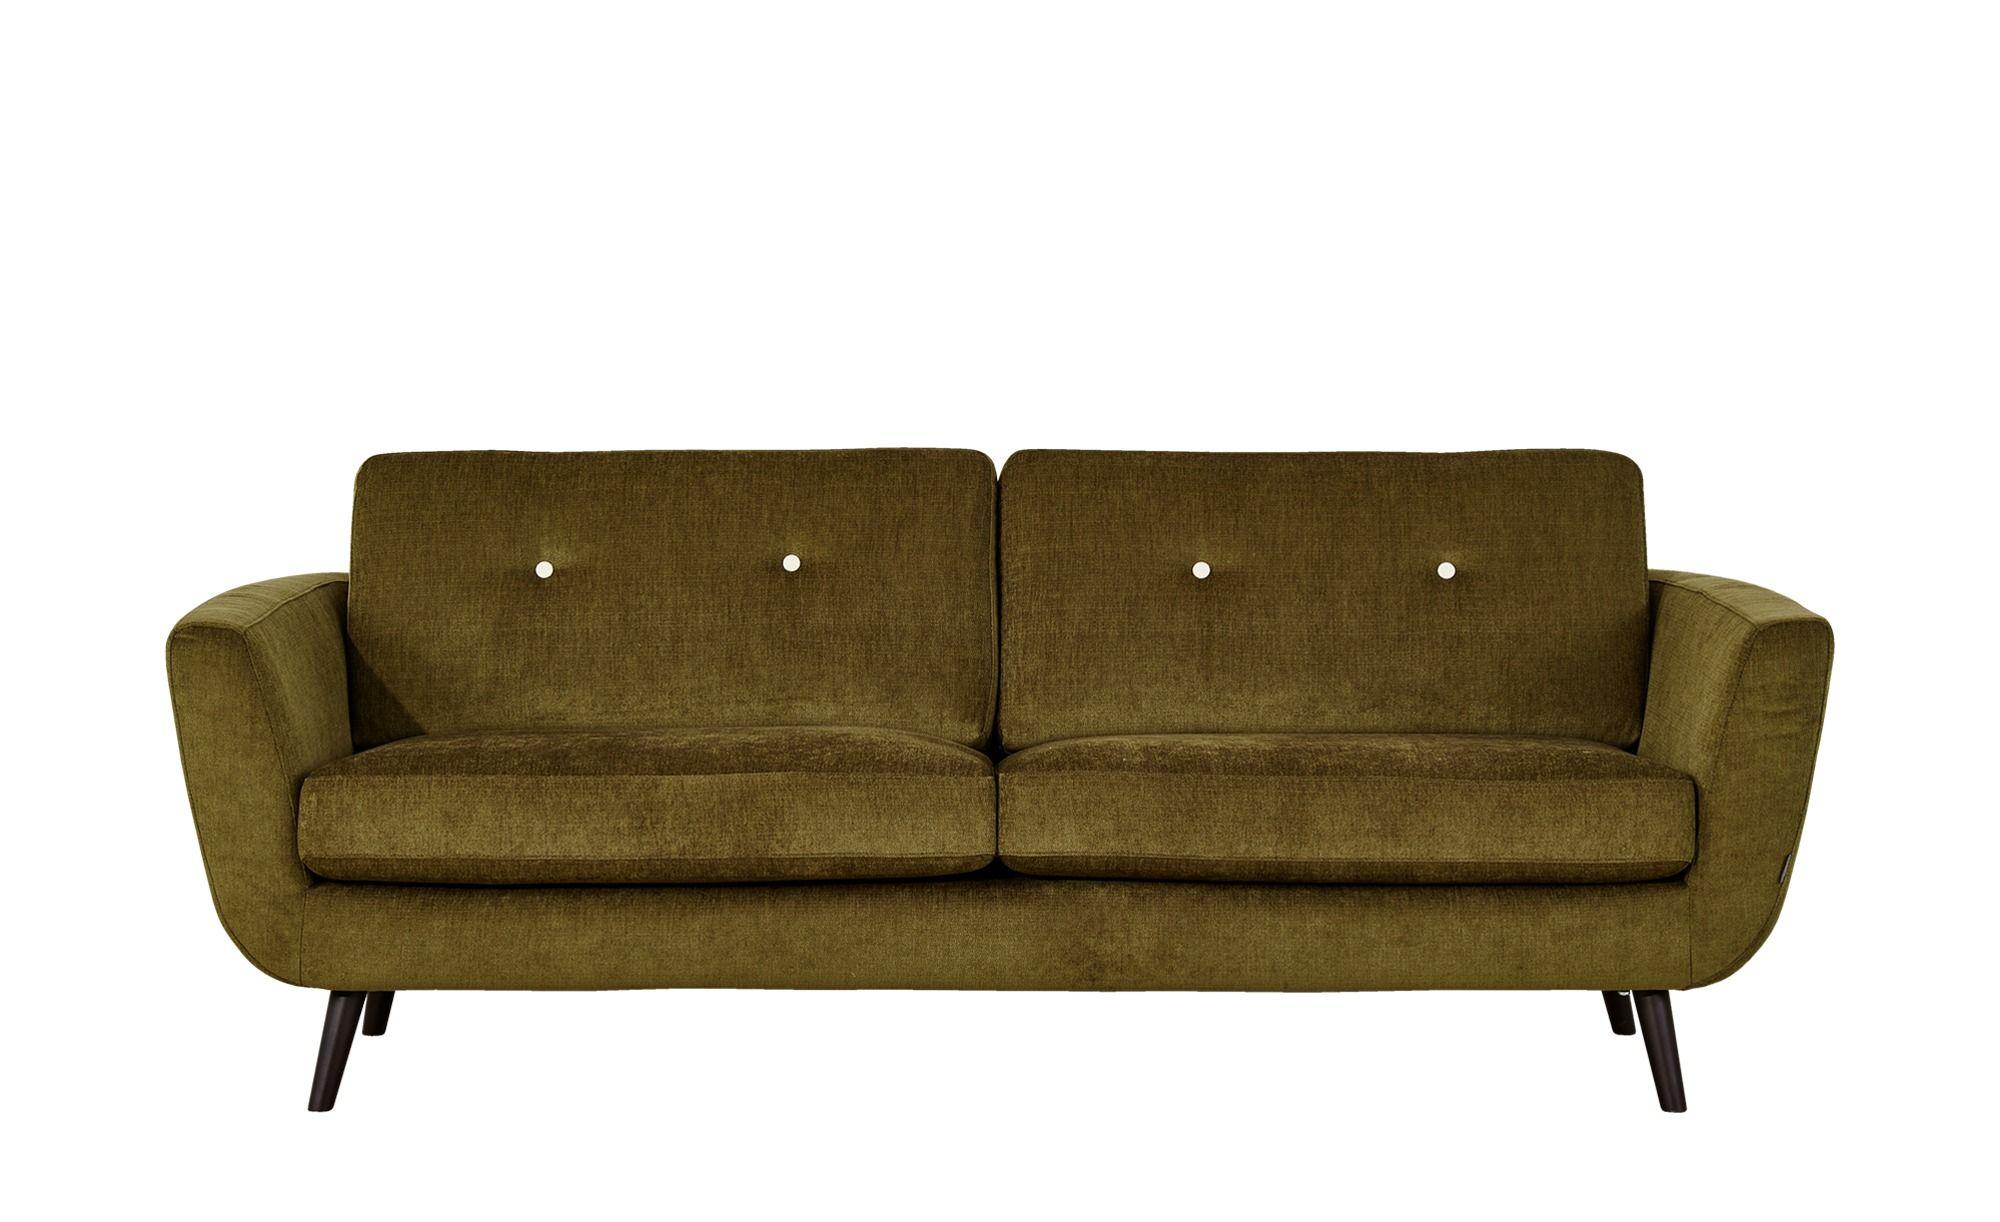 SOHO Sofa 2,5sitzig grün Webstoff Smilla Möbel sofa